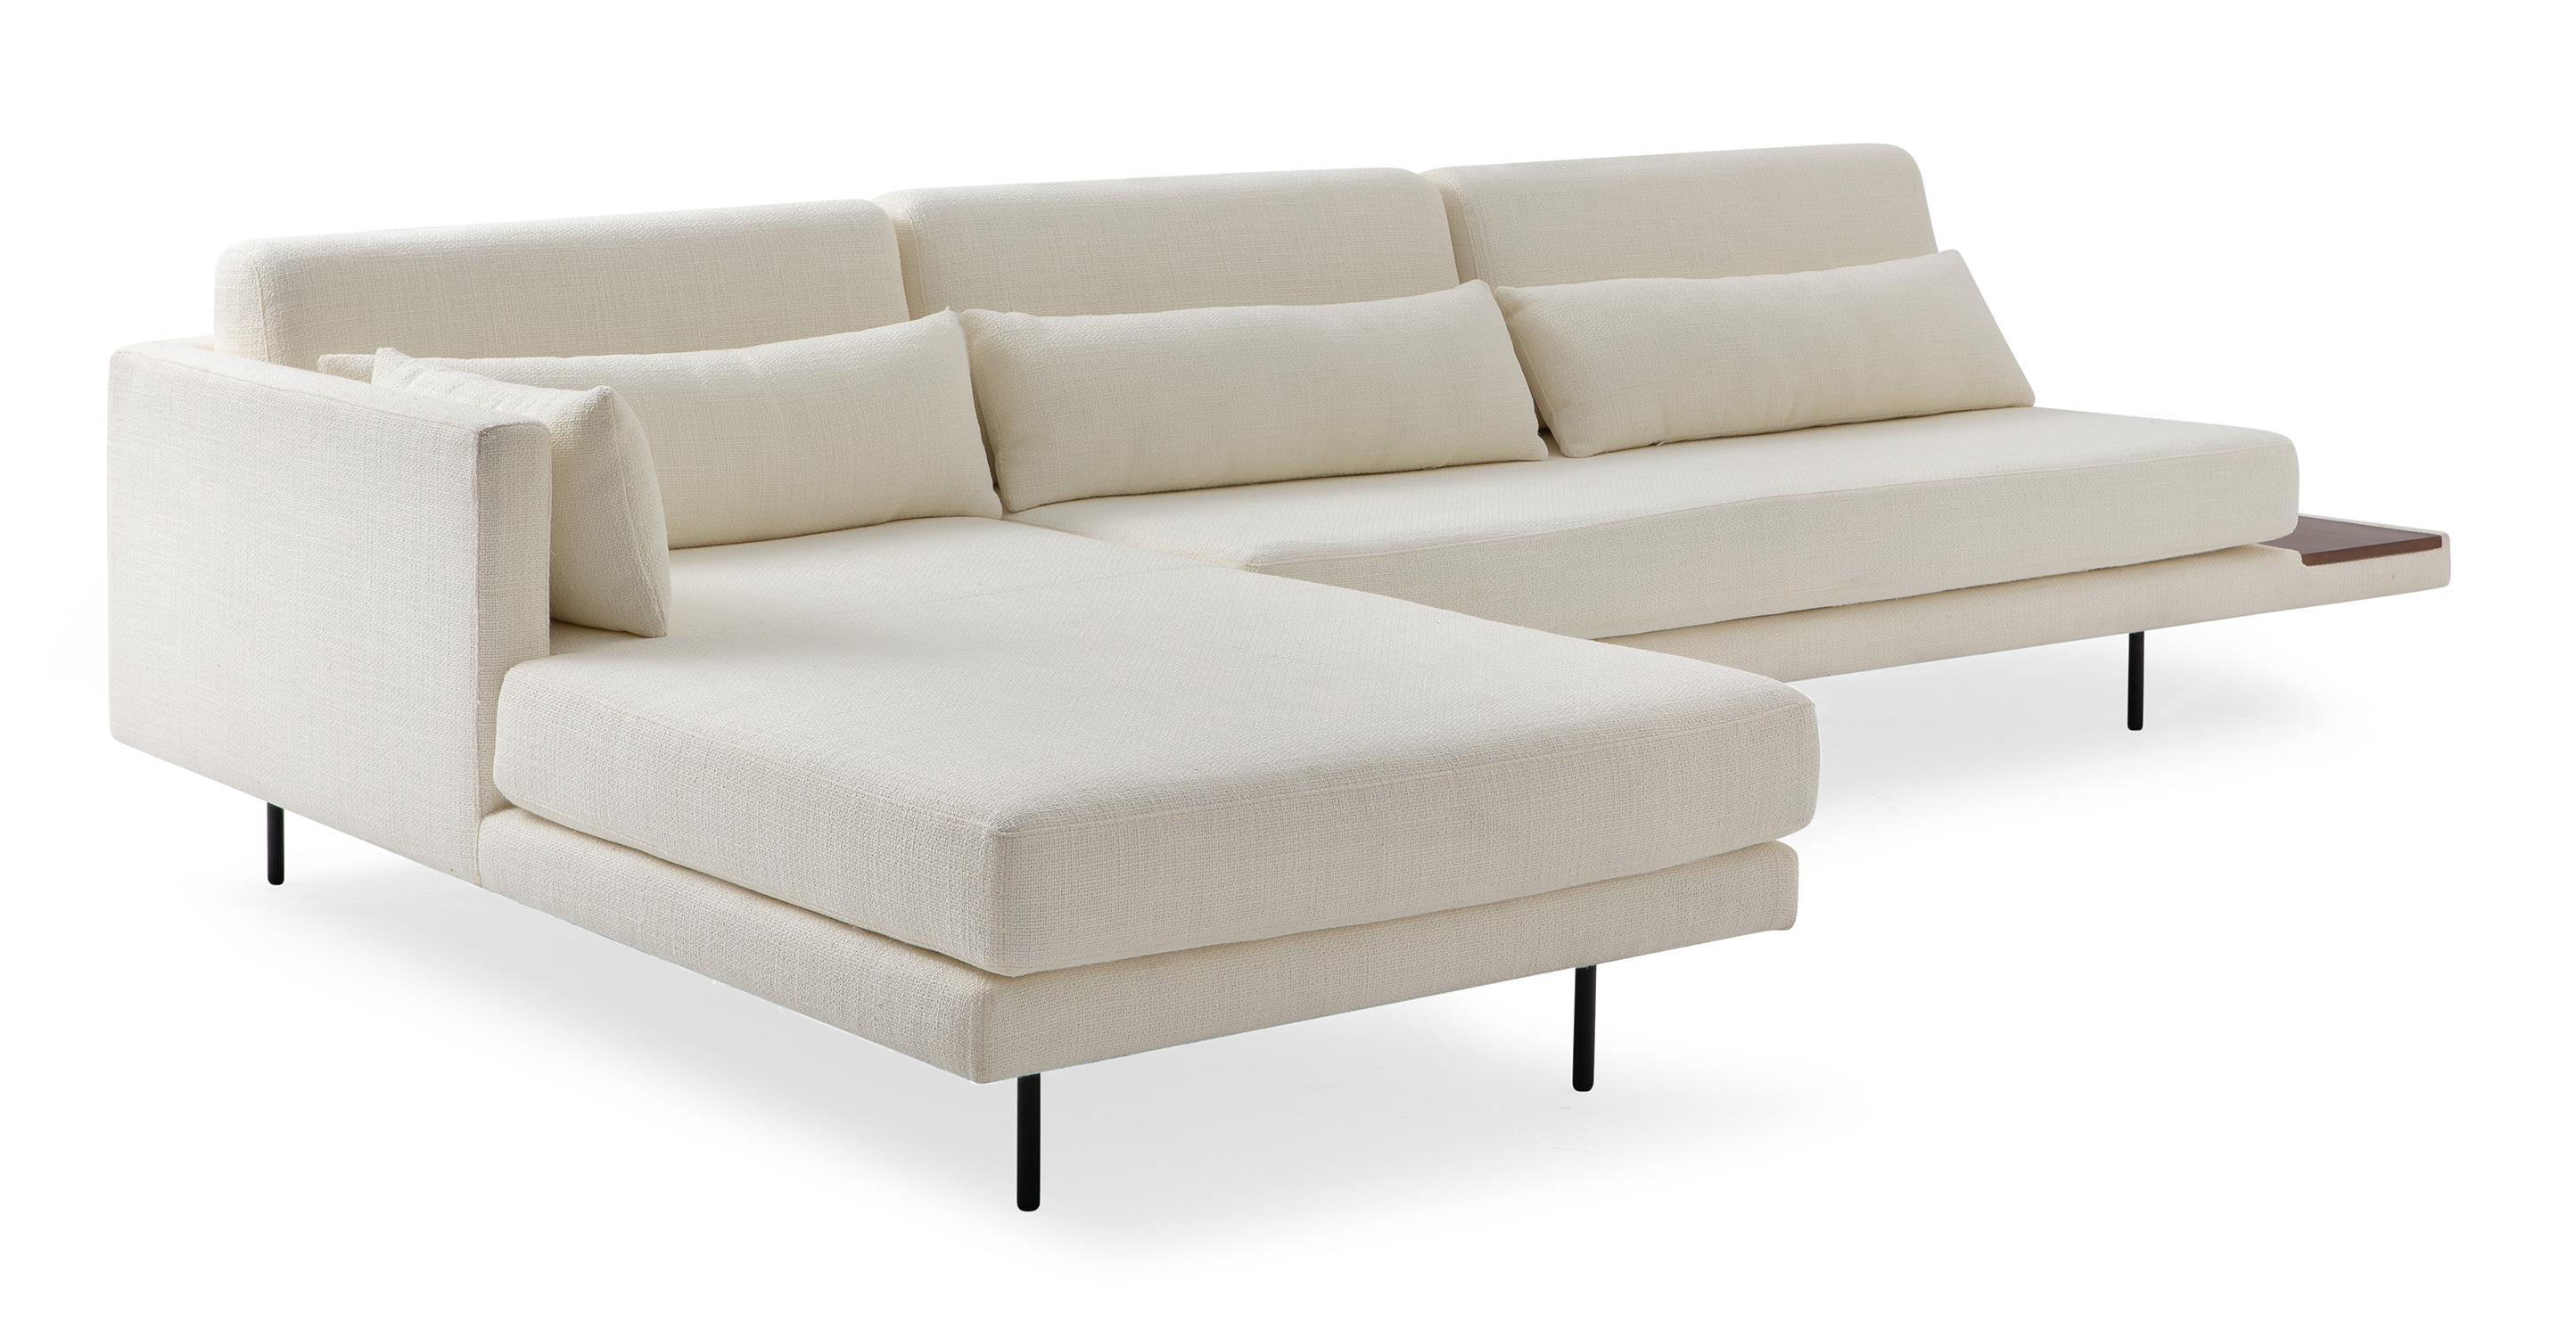 "Davenport 116"" Fabric Sofa Sectional Left, Jour Boucle"